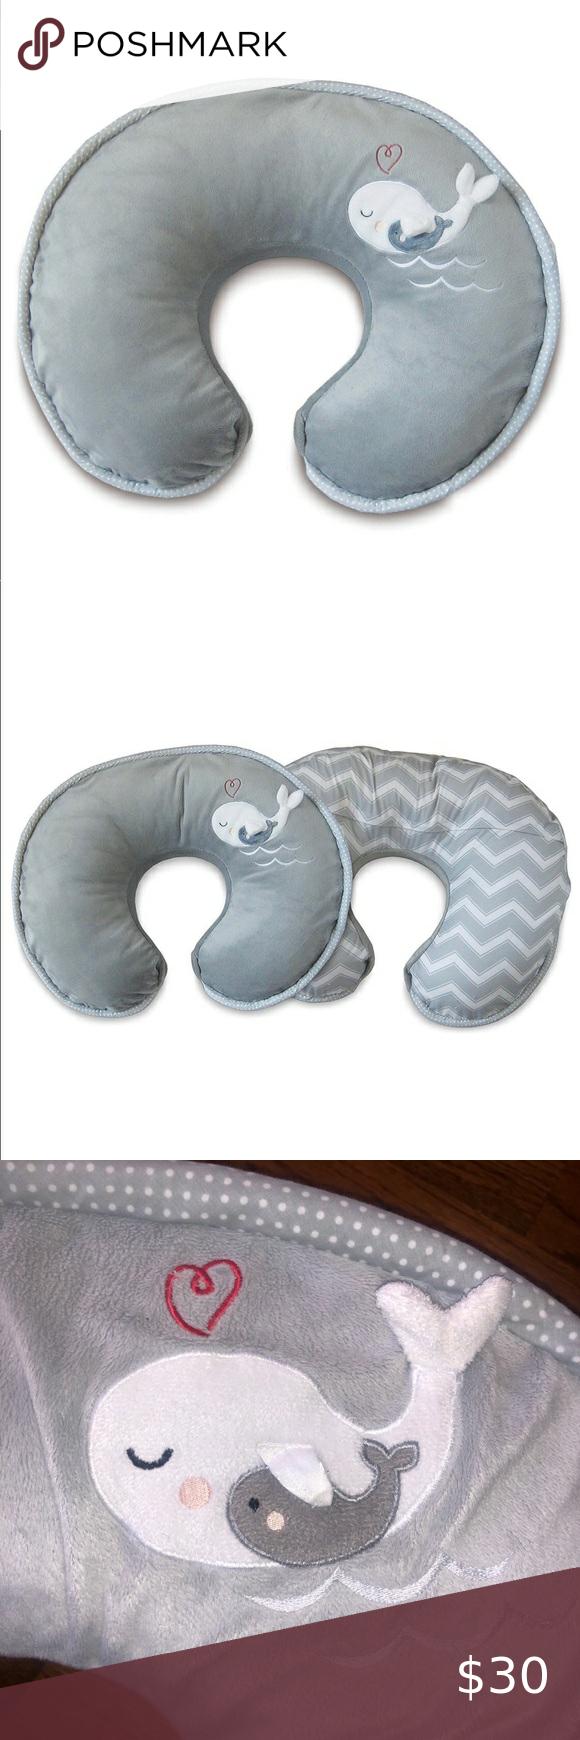 Boppy Luxe Nursing Pillow And Positioner Nursing Pillow Boppy Cool Baby Stuff